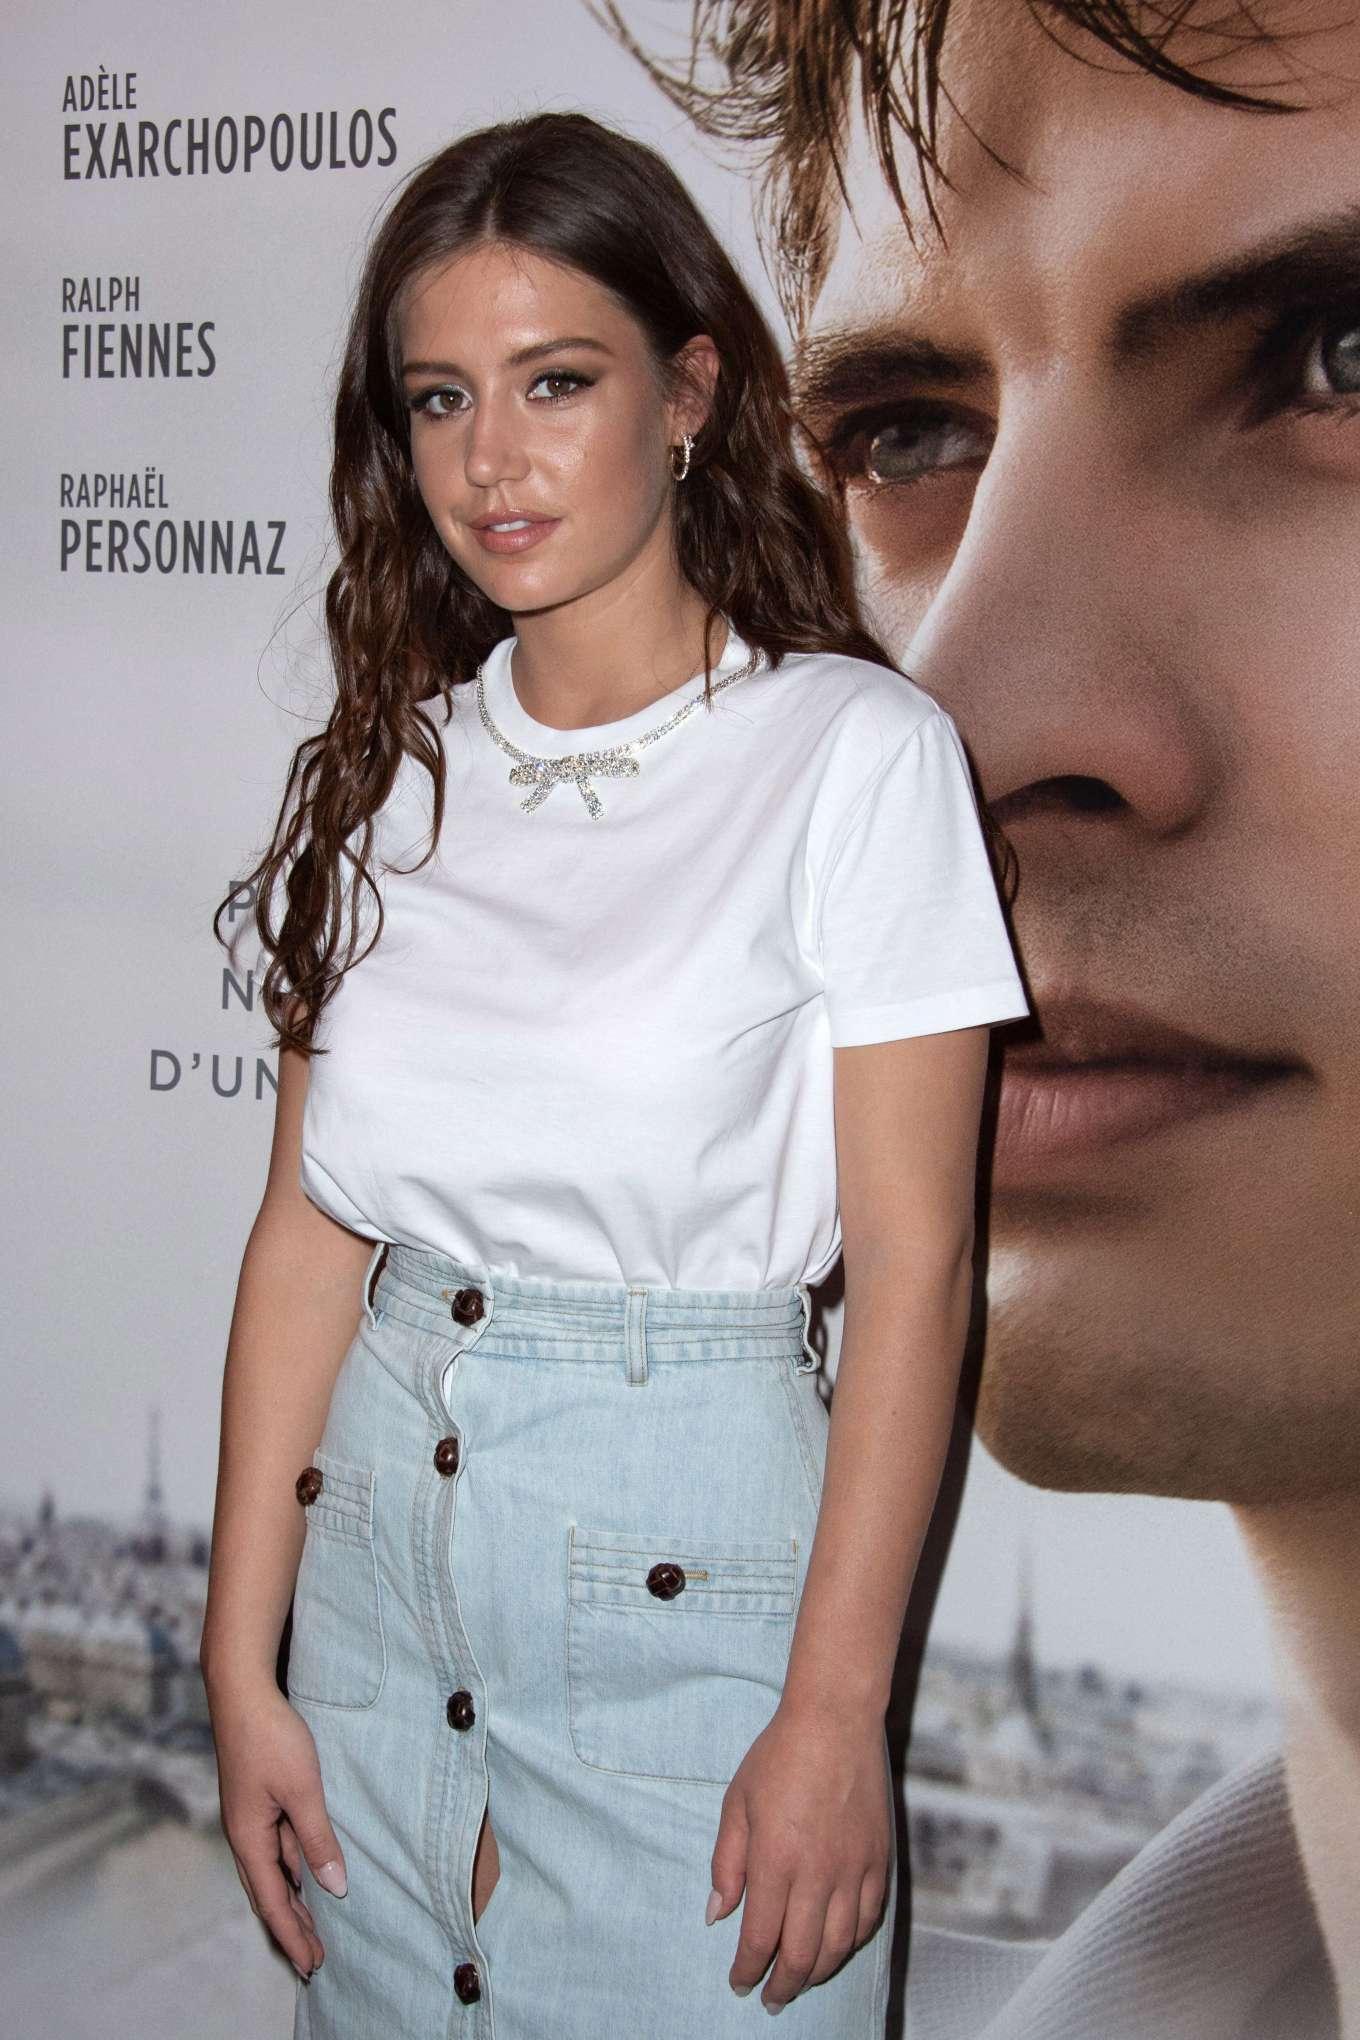 Adele Exarchopoulos - 'Noureev' Premiere at the Gaumont Capucines Cinema in Paris